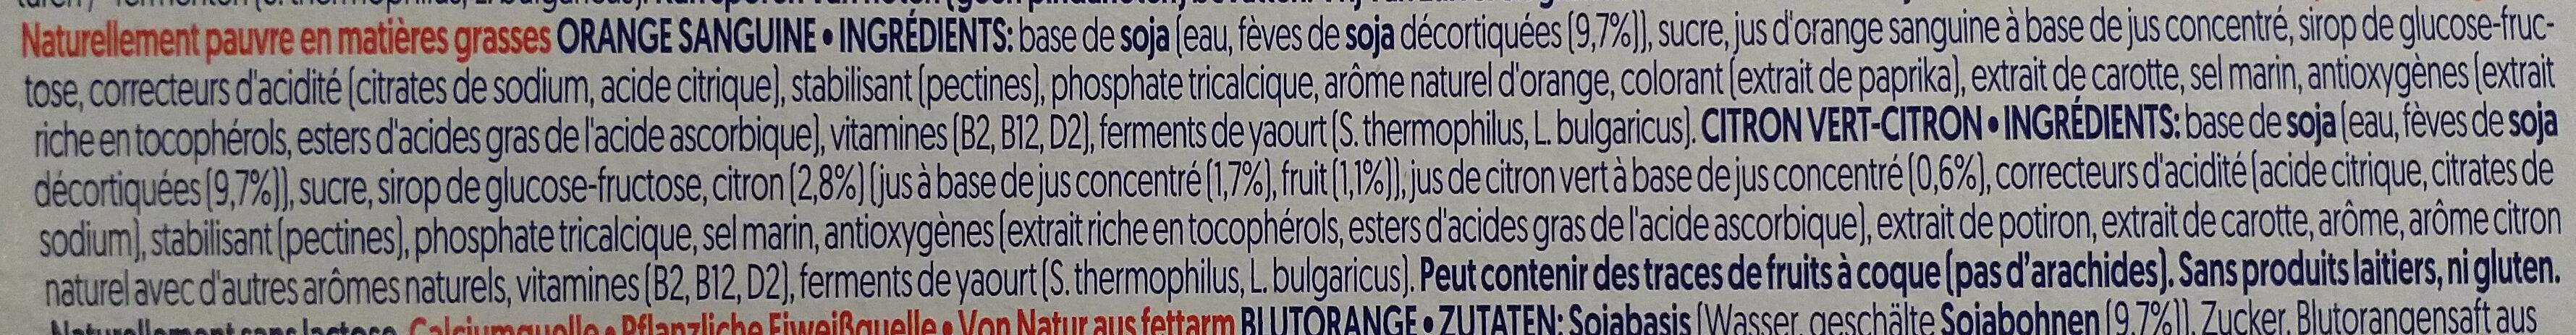 Yaourt agrumes - Ingredients - fr